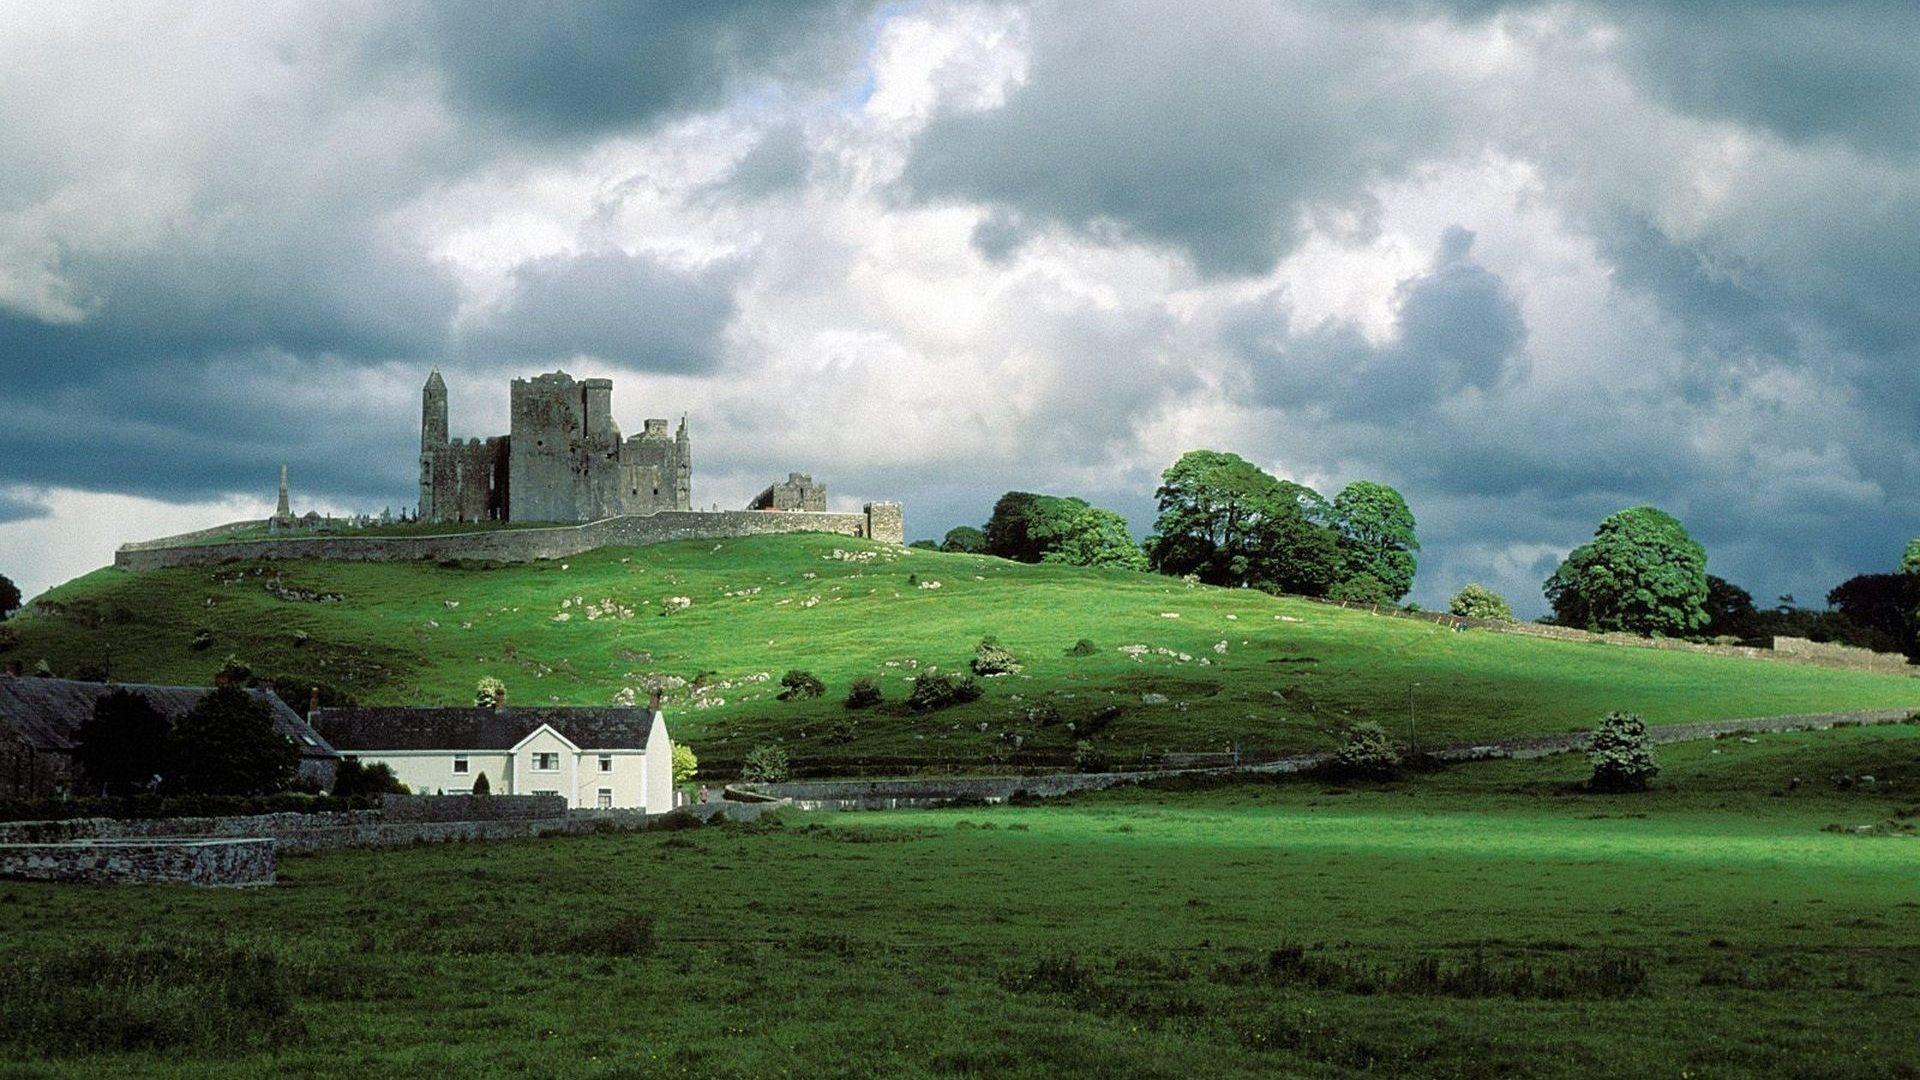 Landscapes Ruins Ireland Rock Of Cashel 1920x1080 Wallpaper Castles In Ireland Ireland Landscape Ireland Pictures